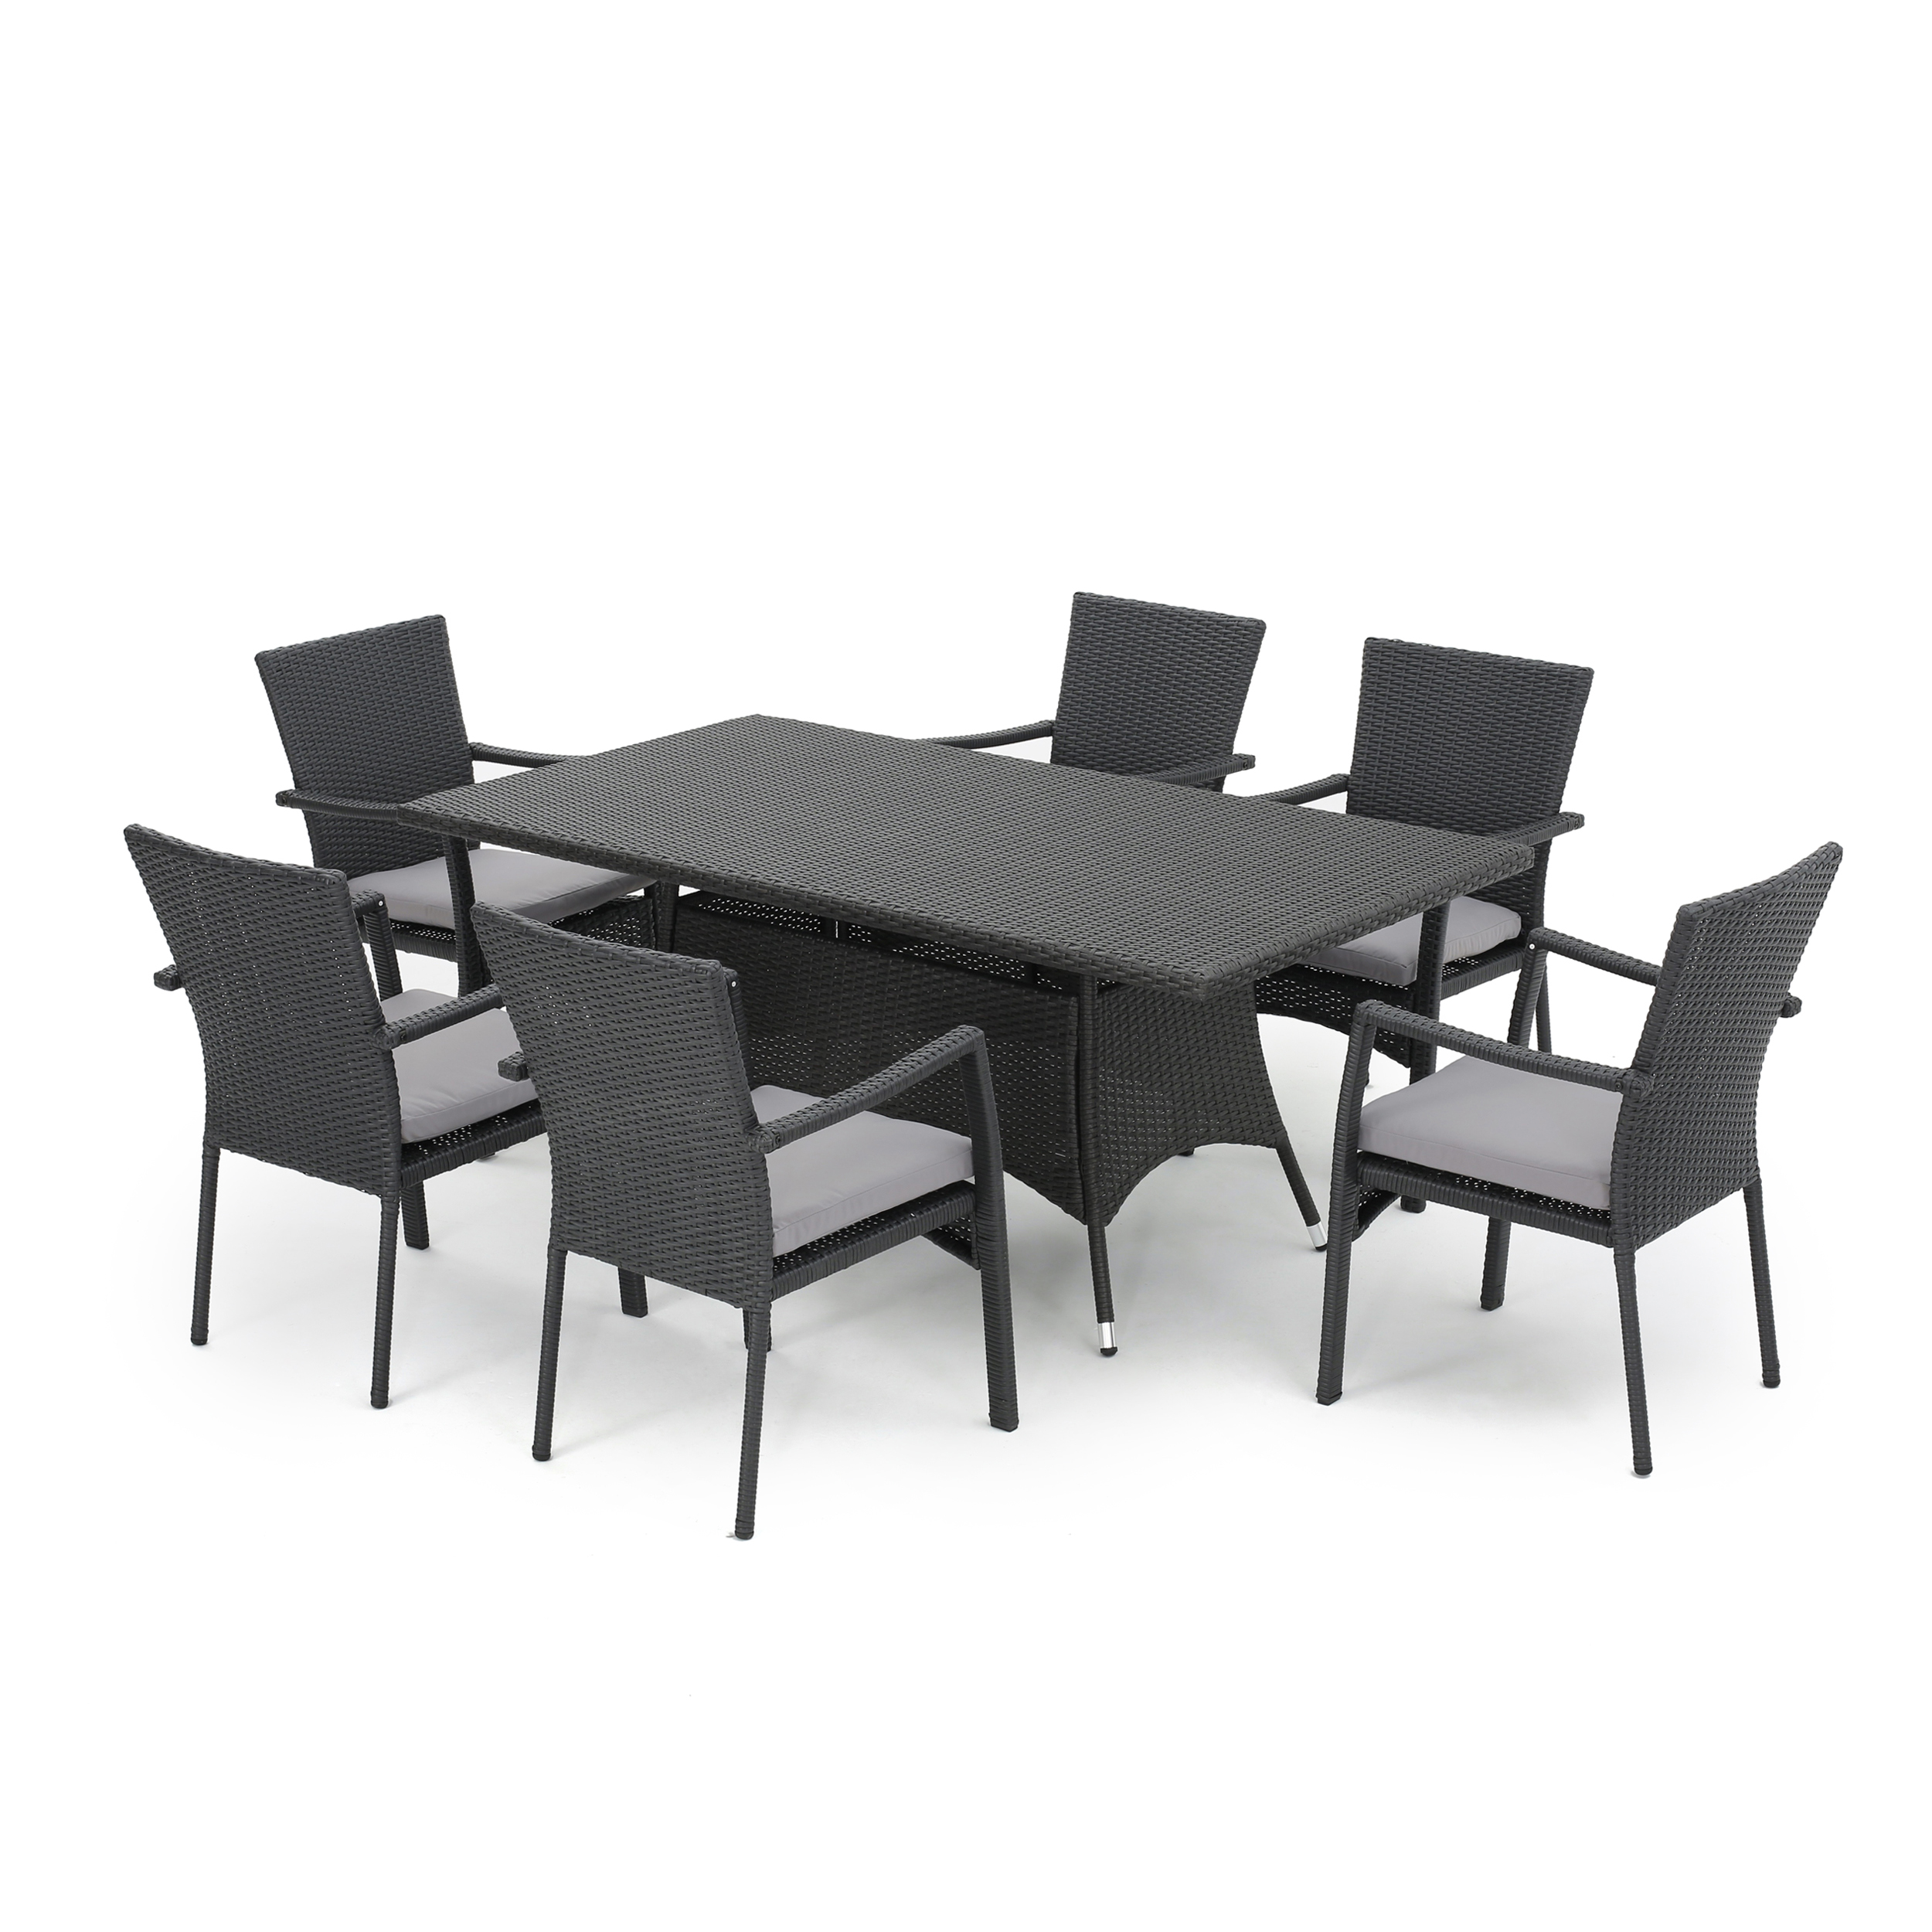 Tompkins 7 Piece Wicker Rectangular Dining Set, Grey